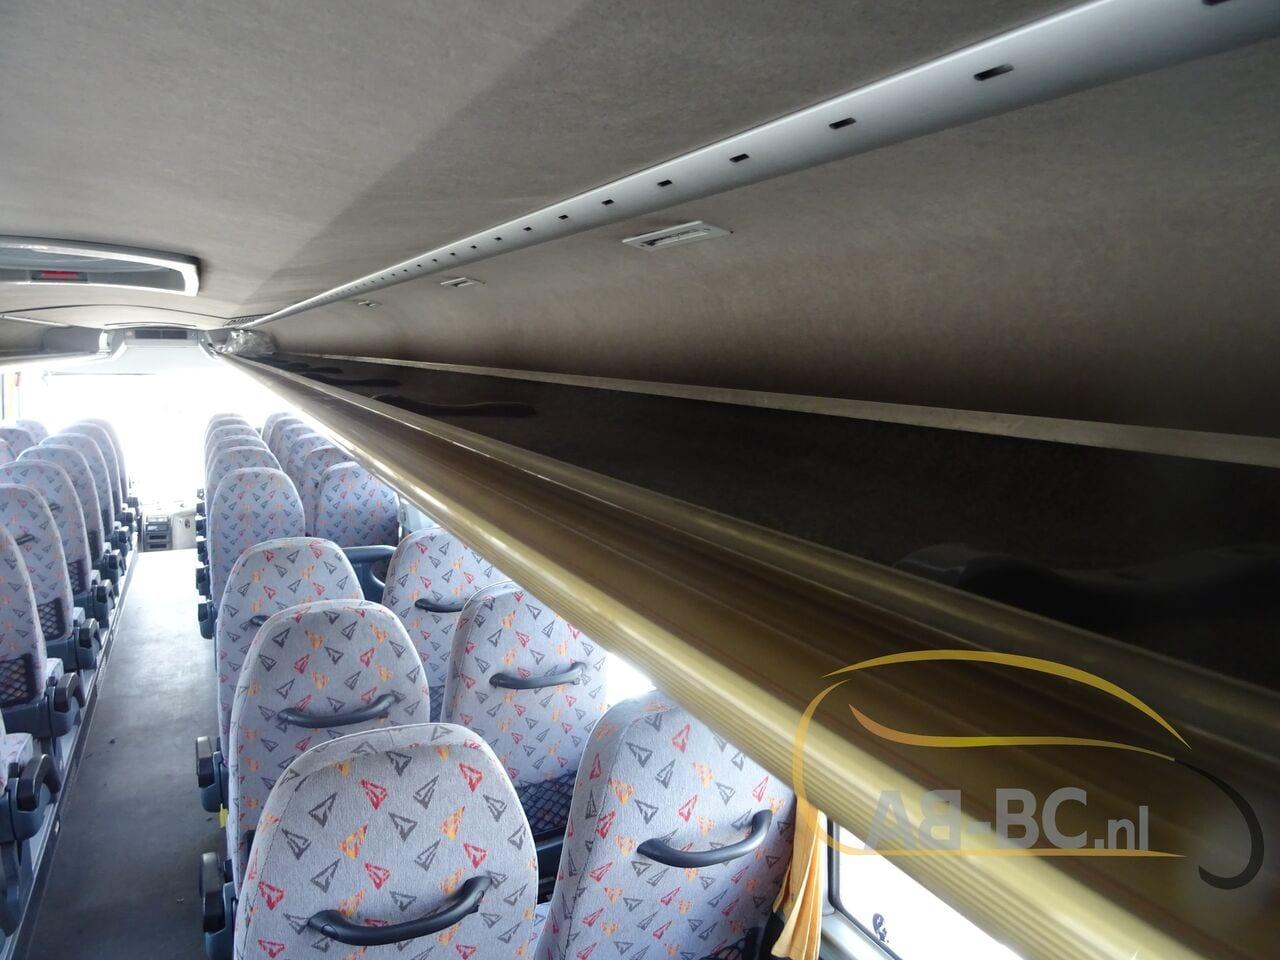 coach-busTEMSA-Safari-RD-DAF-Motor-53-Seats-Euro-5---1623932597691642624_big_b5734af075d939c101fcc6c6028e82e7--21061715155620919600